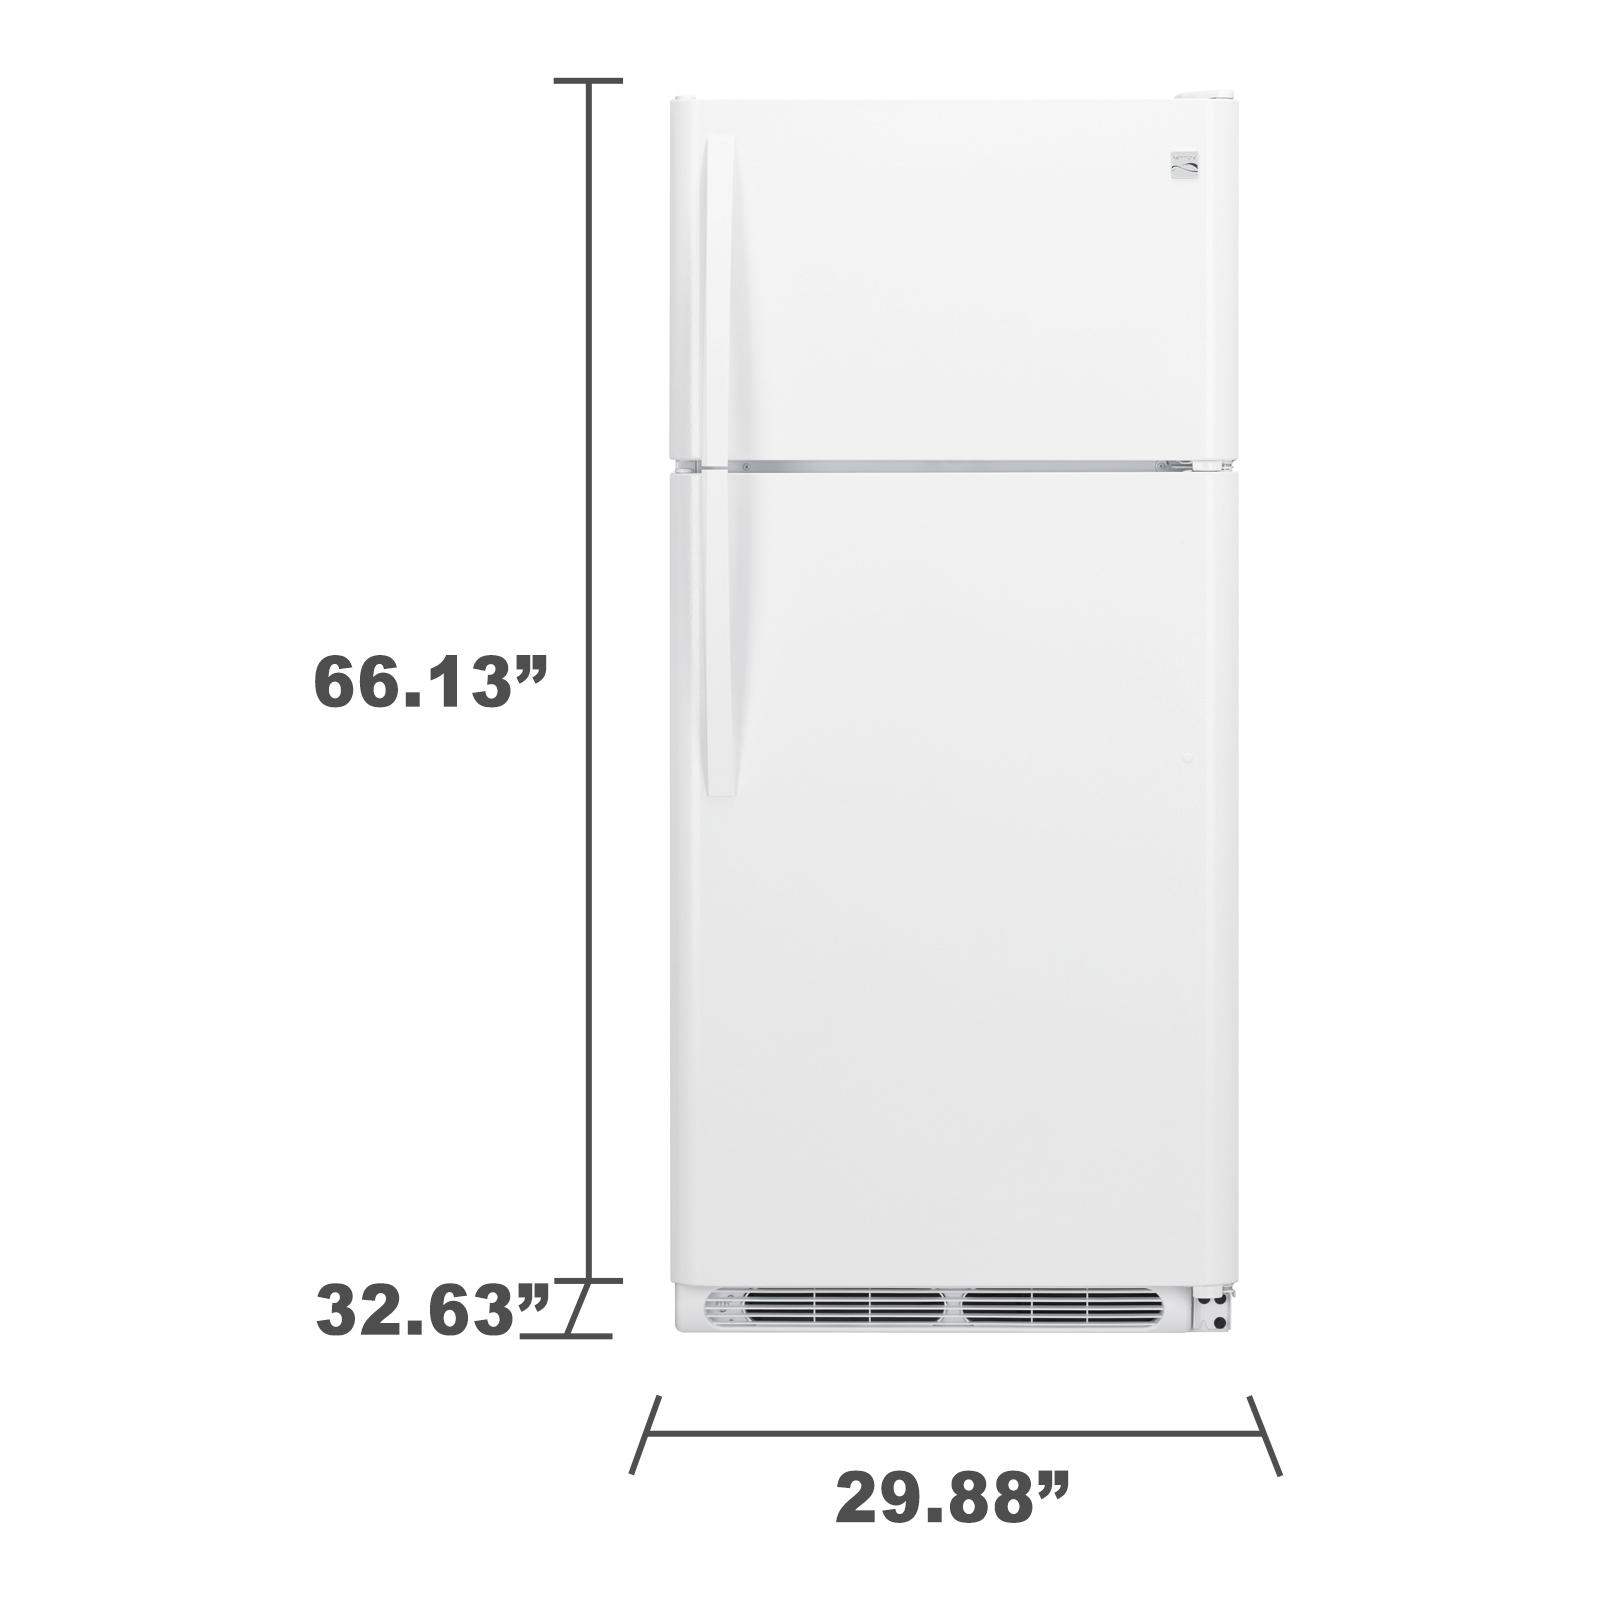 Kenmore 70602 18 cu. ft. Top Freezer Refrigerator - White